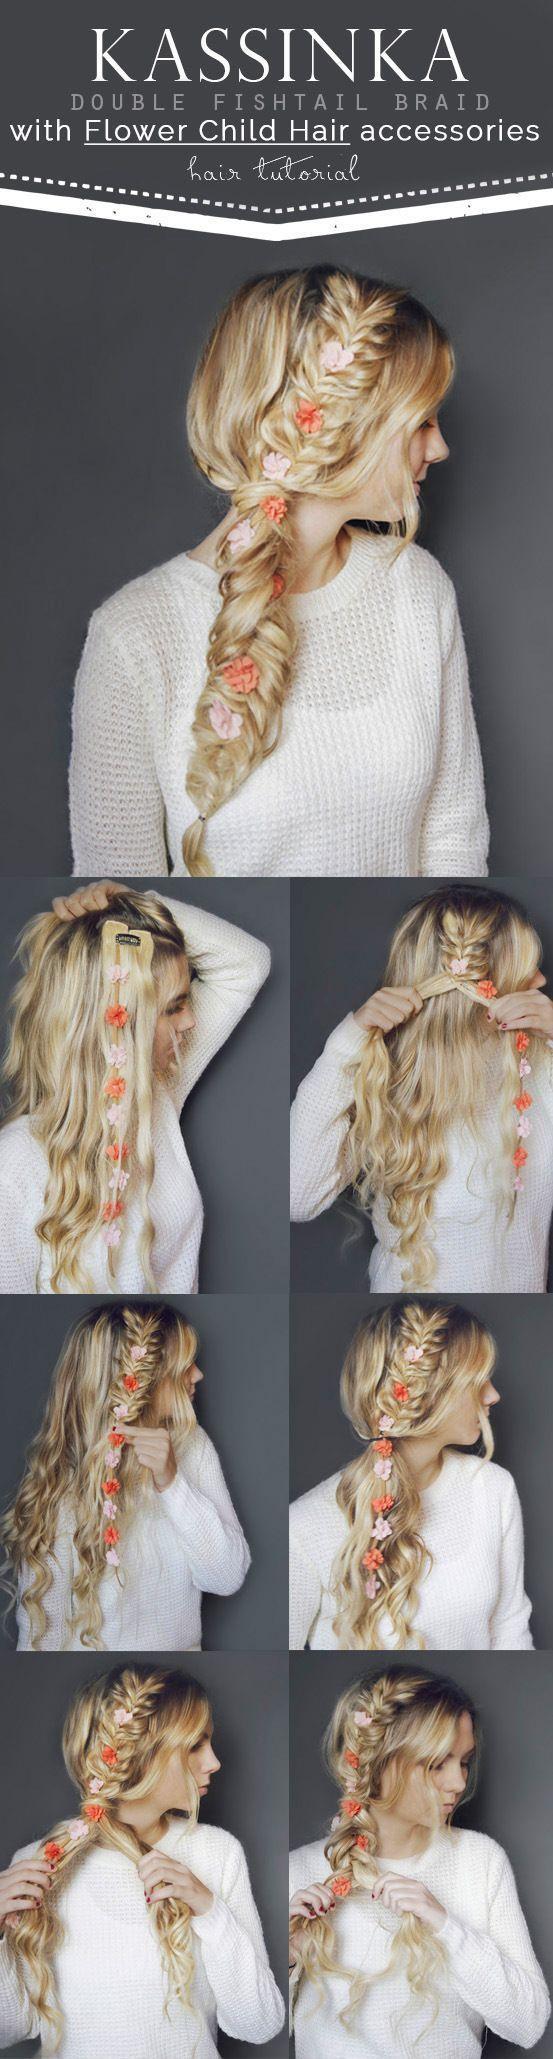 Hair tutorials kassinka hair tutorial with bleach blonde luxy hair